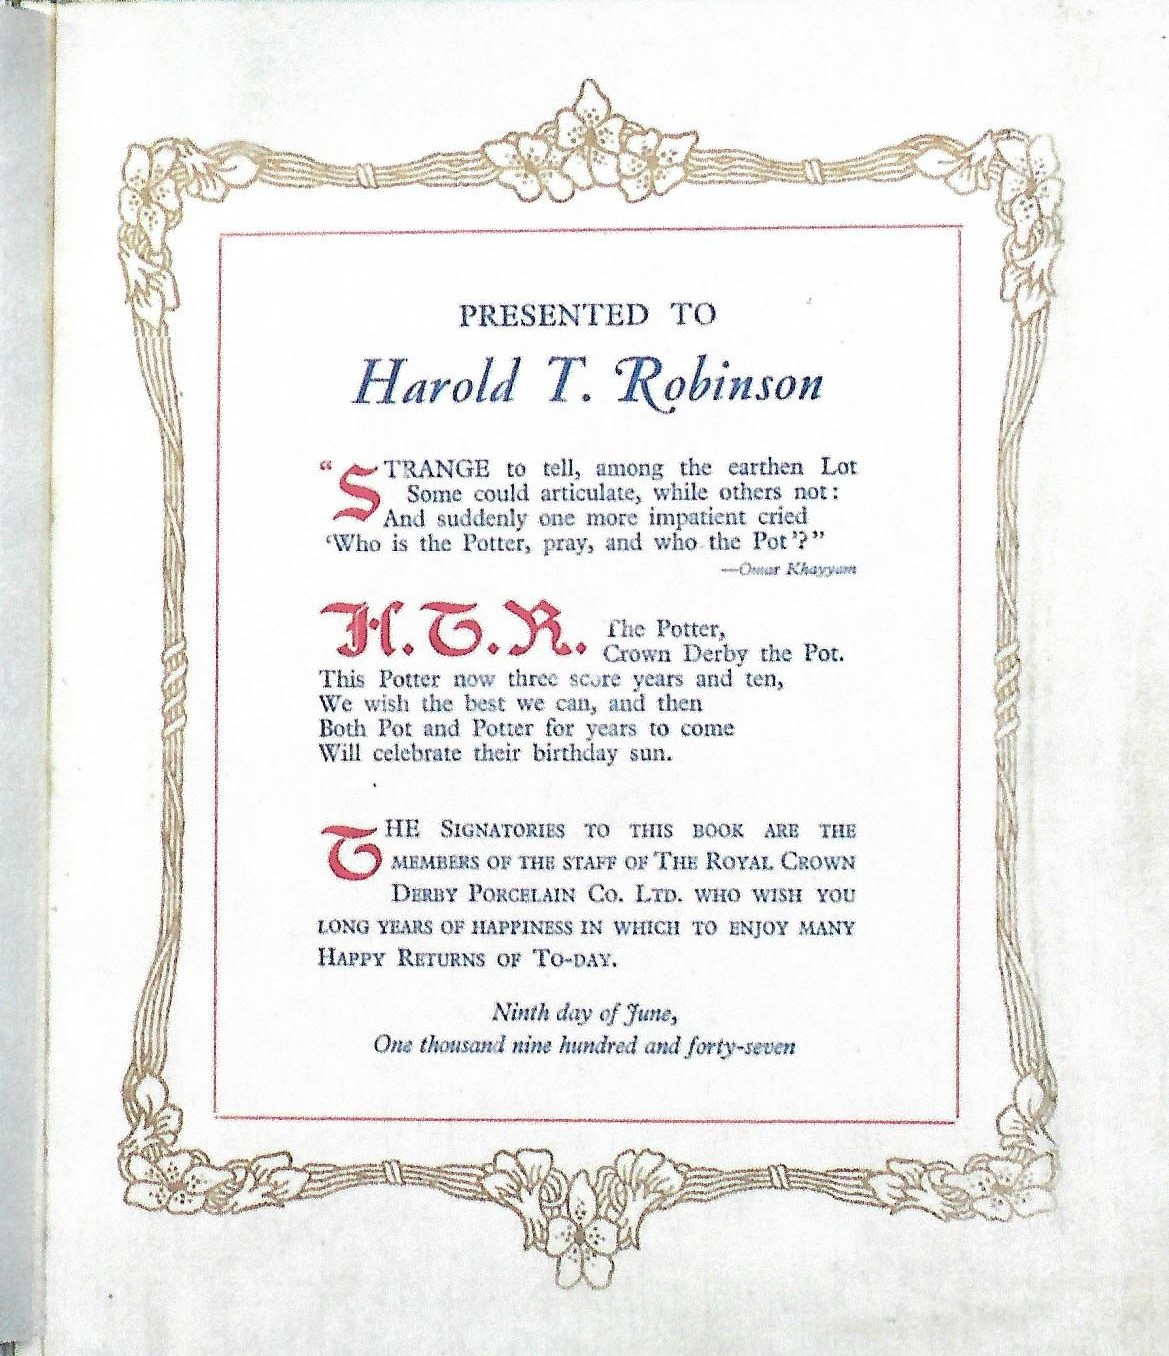 royal-crown-derby-harold-robinson-70th-birthday-book-inscription.jpg